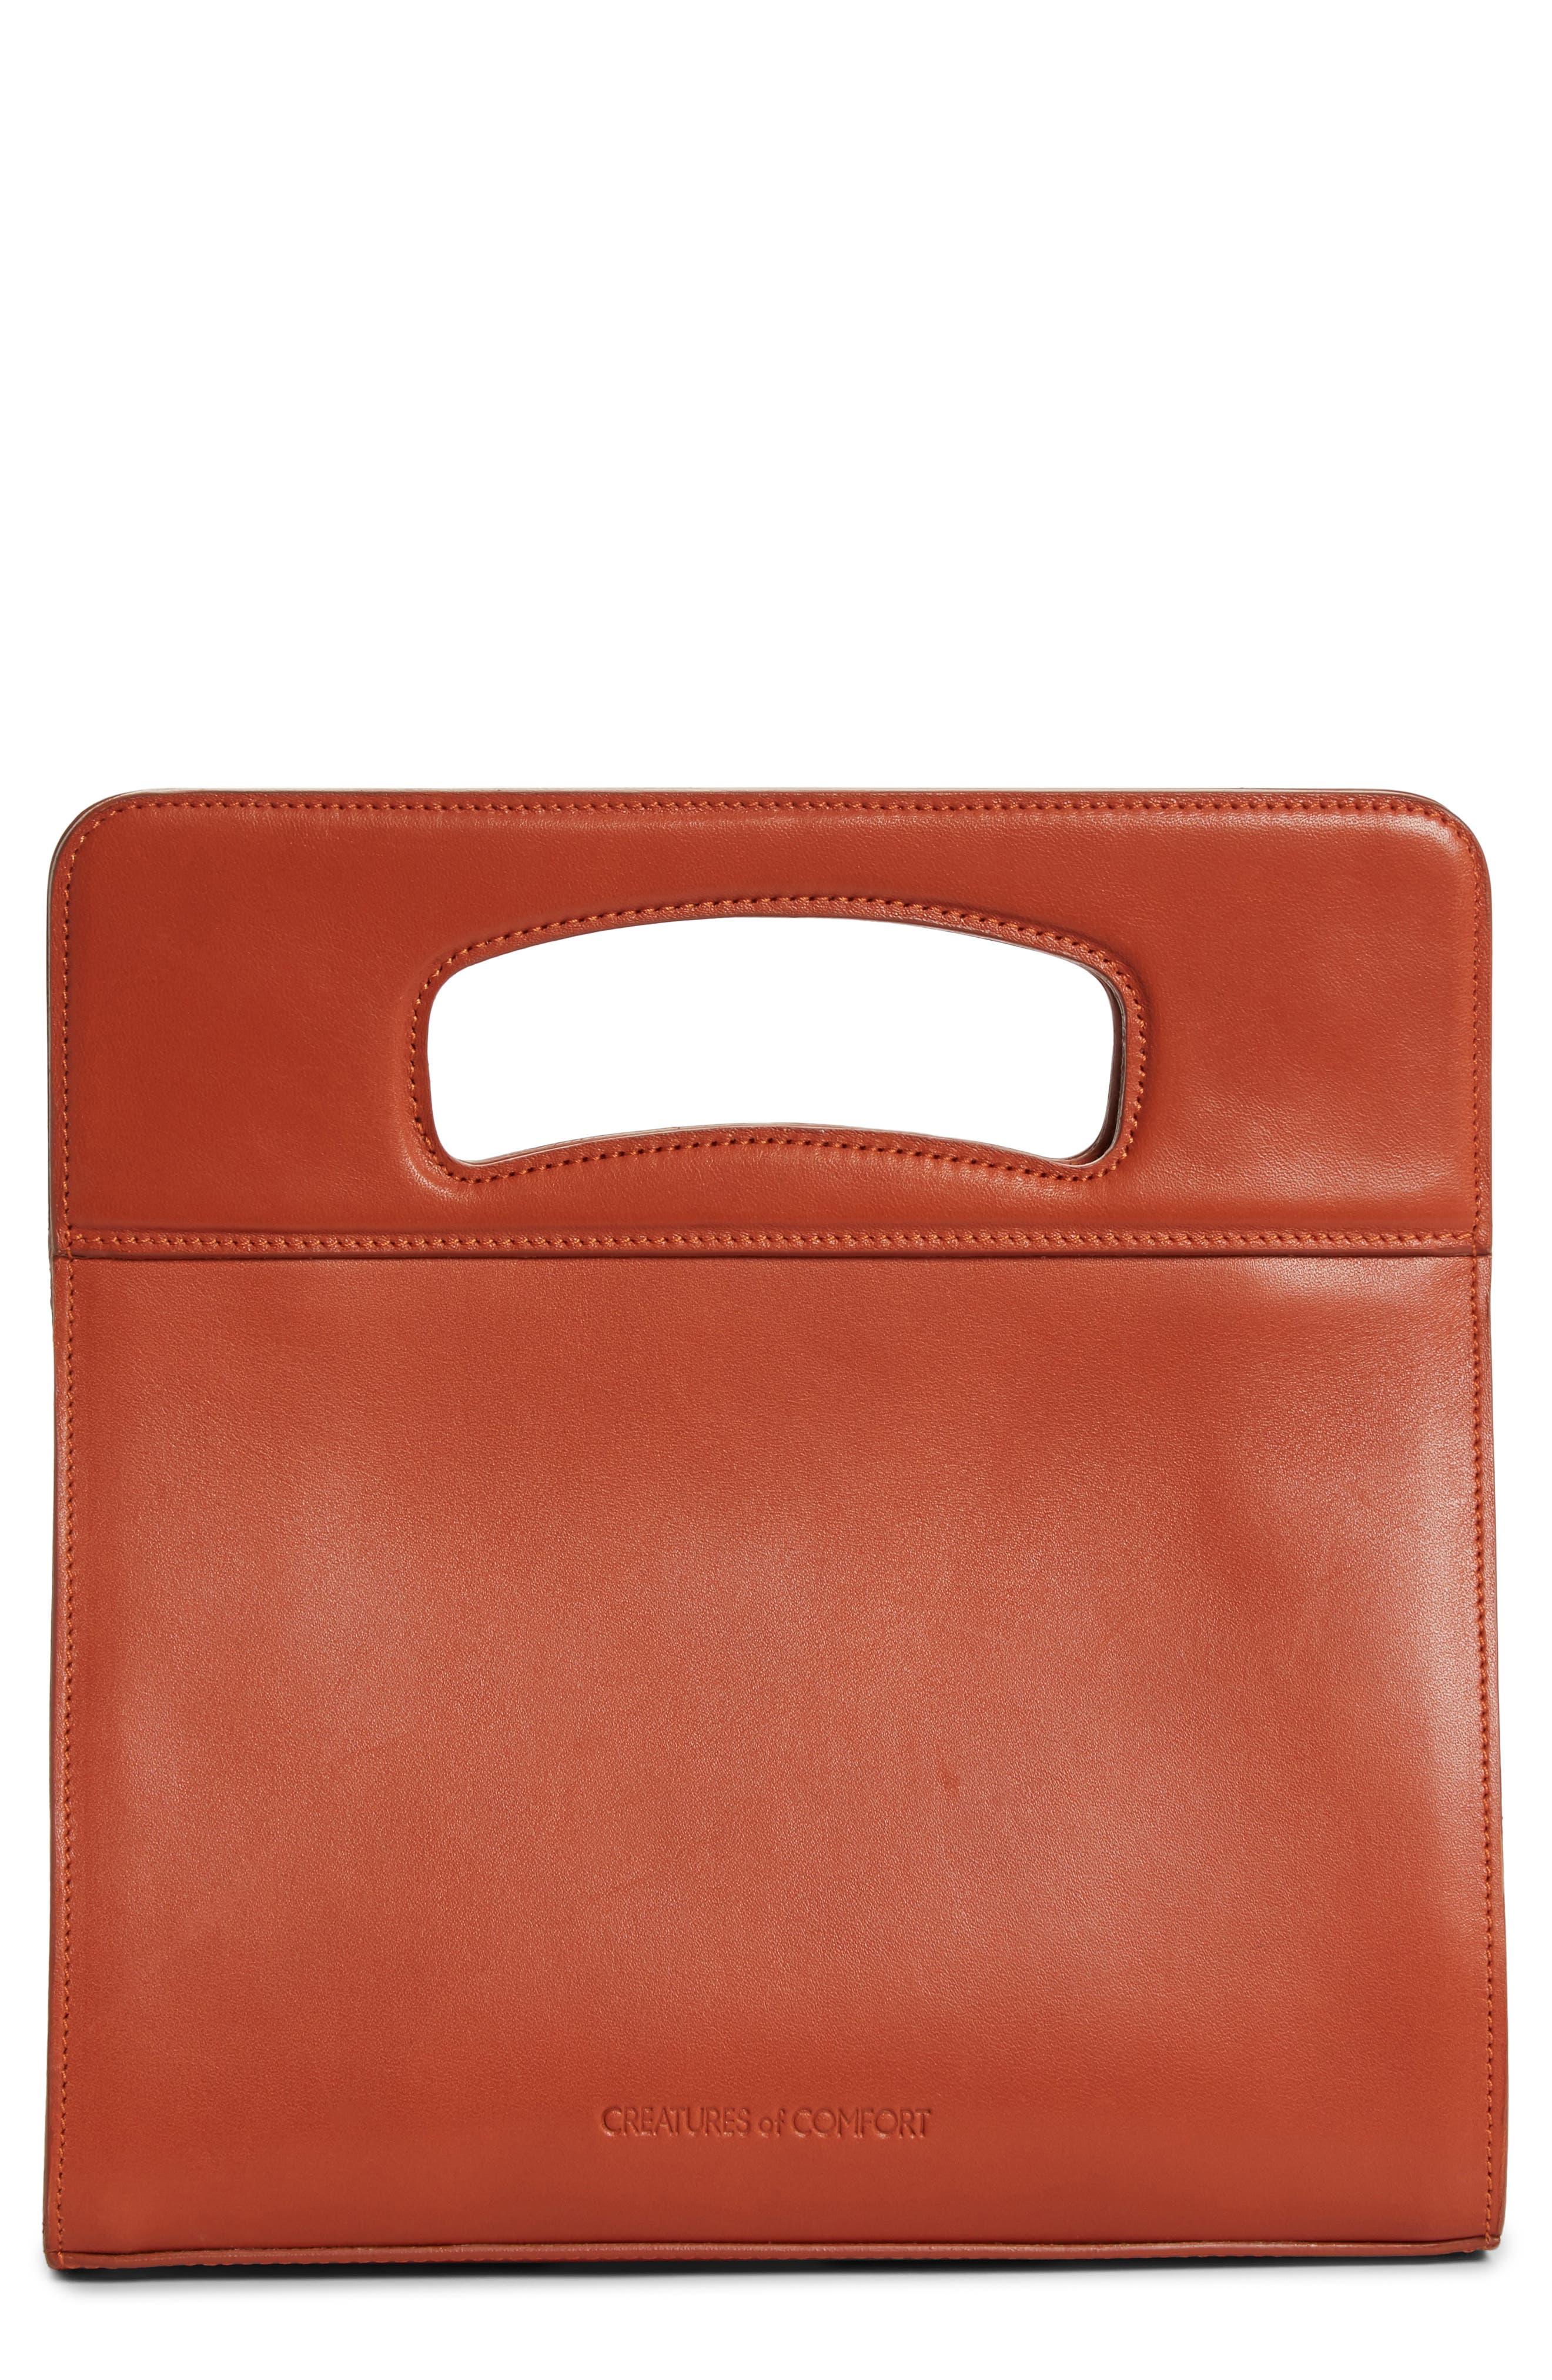 Gilda Crossbody Bag,                             Main thumbnail 1, color,                             Clove